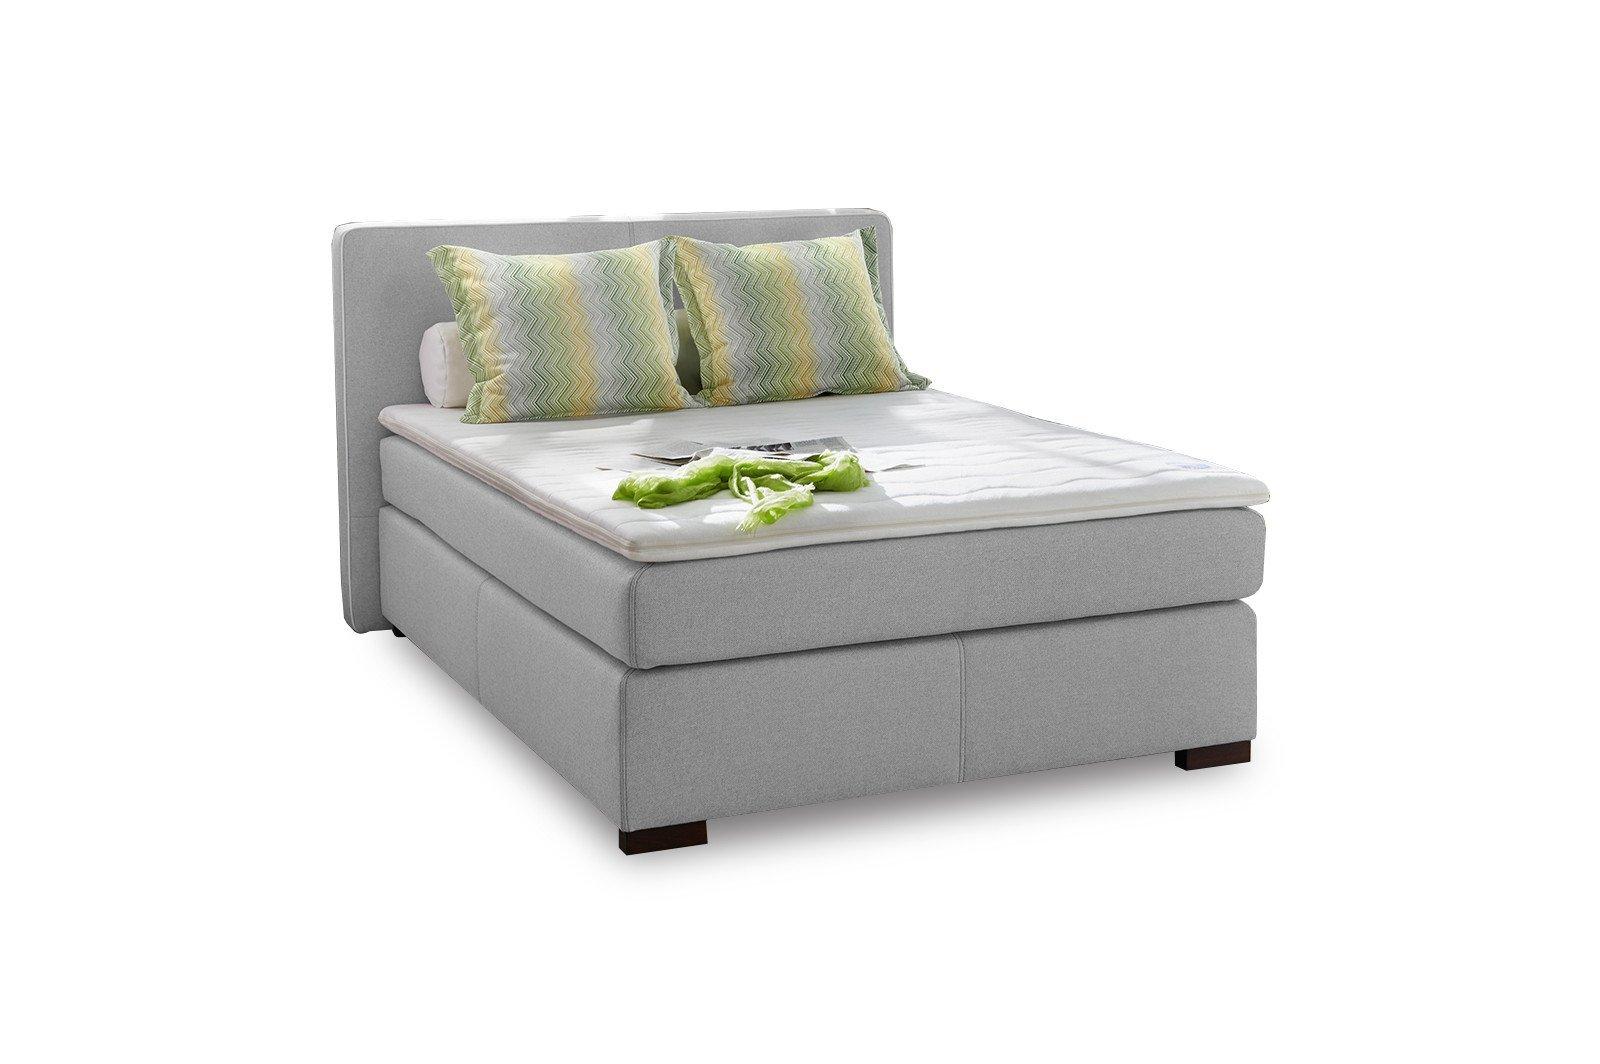 jockenh fer boxspringbett isabel in grau m bel letz. Black Bedroom Furniture Sets. Home Design Ideas